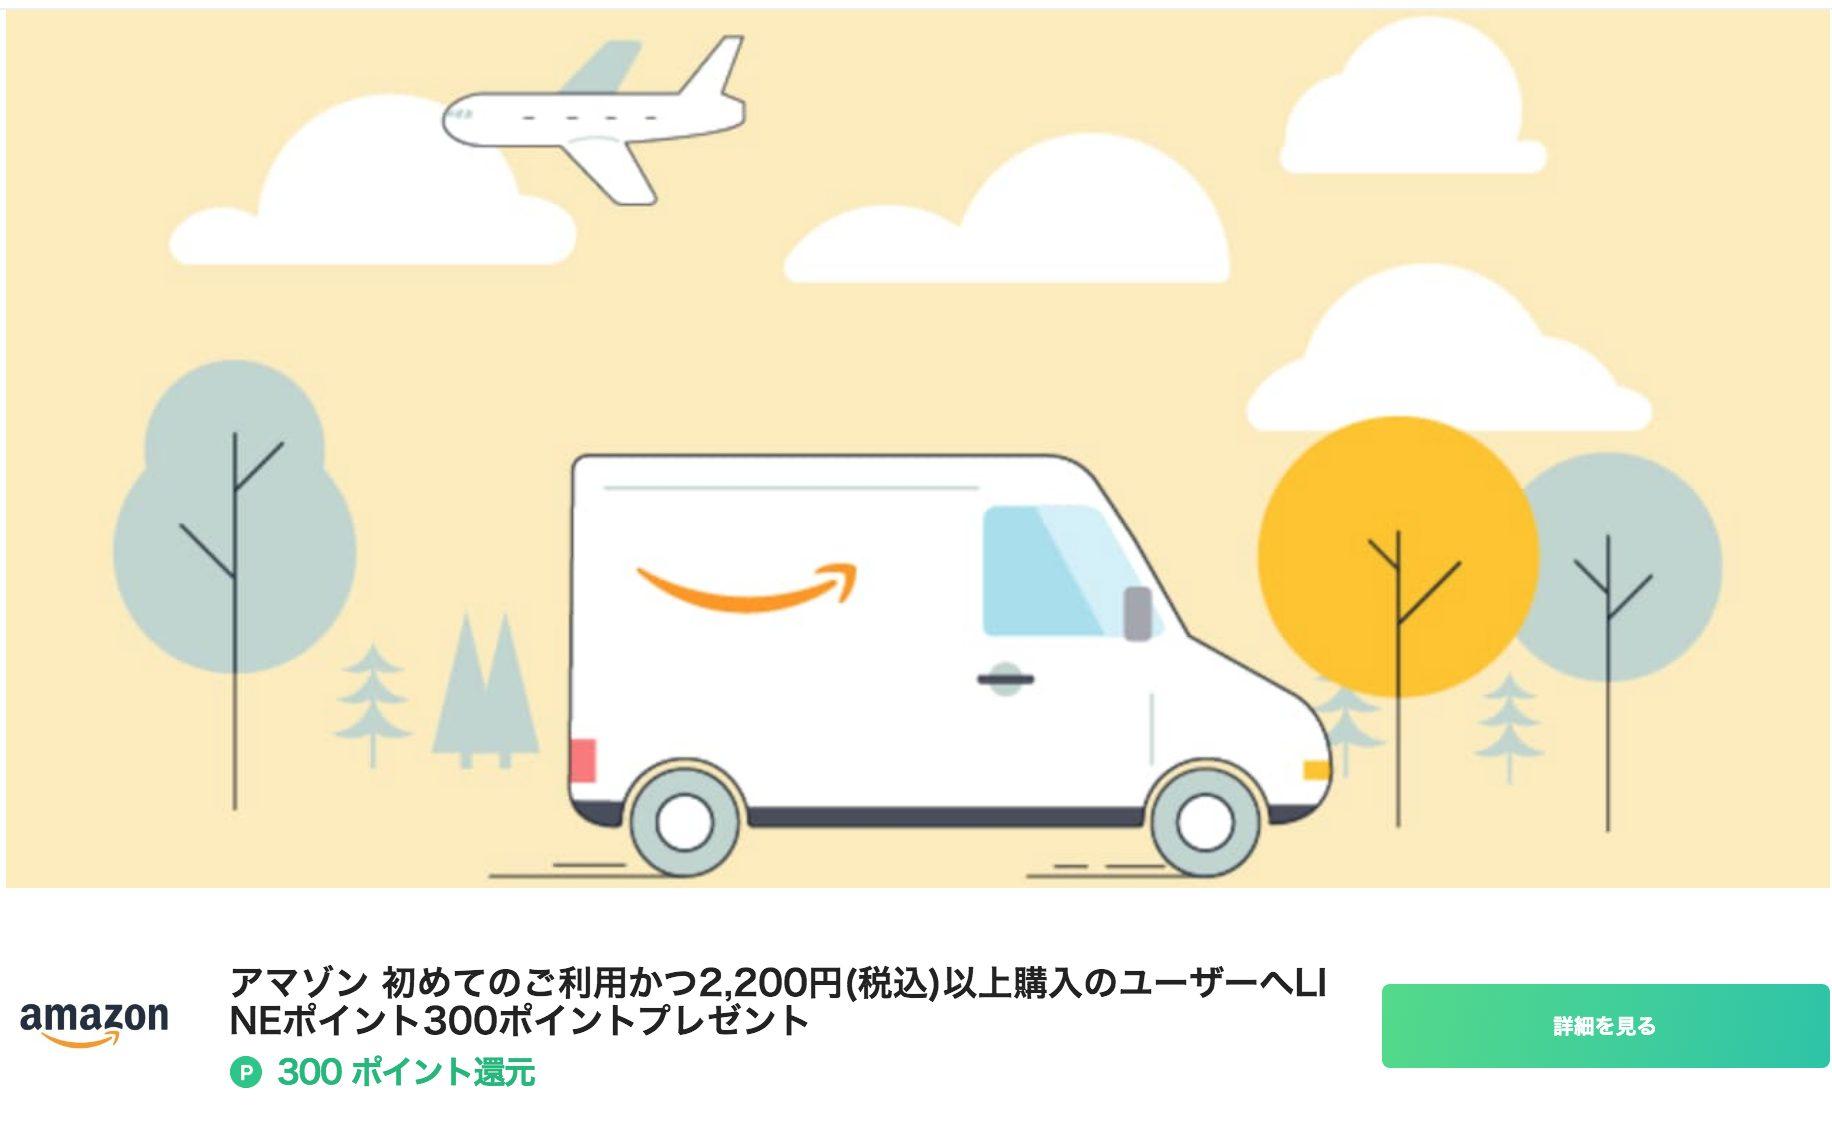 LINEショッピングのAmazon